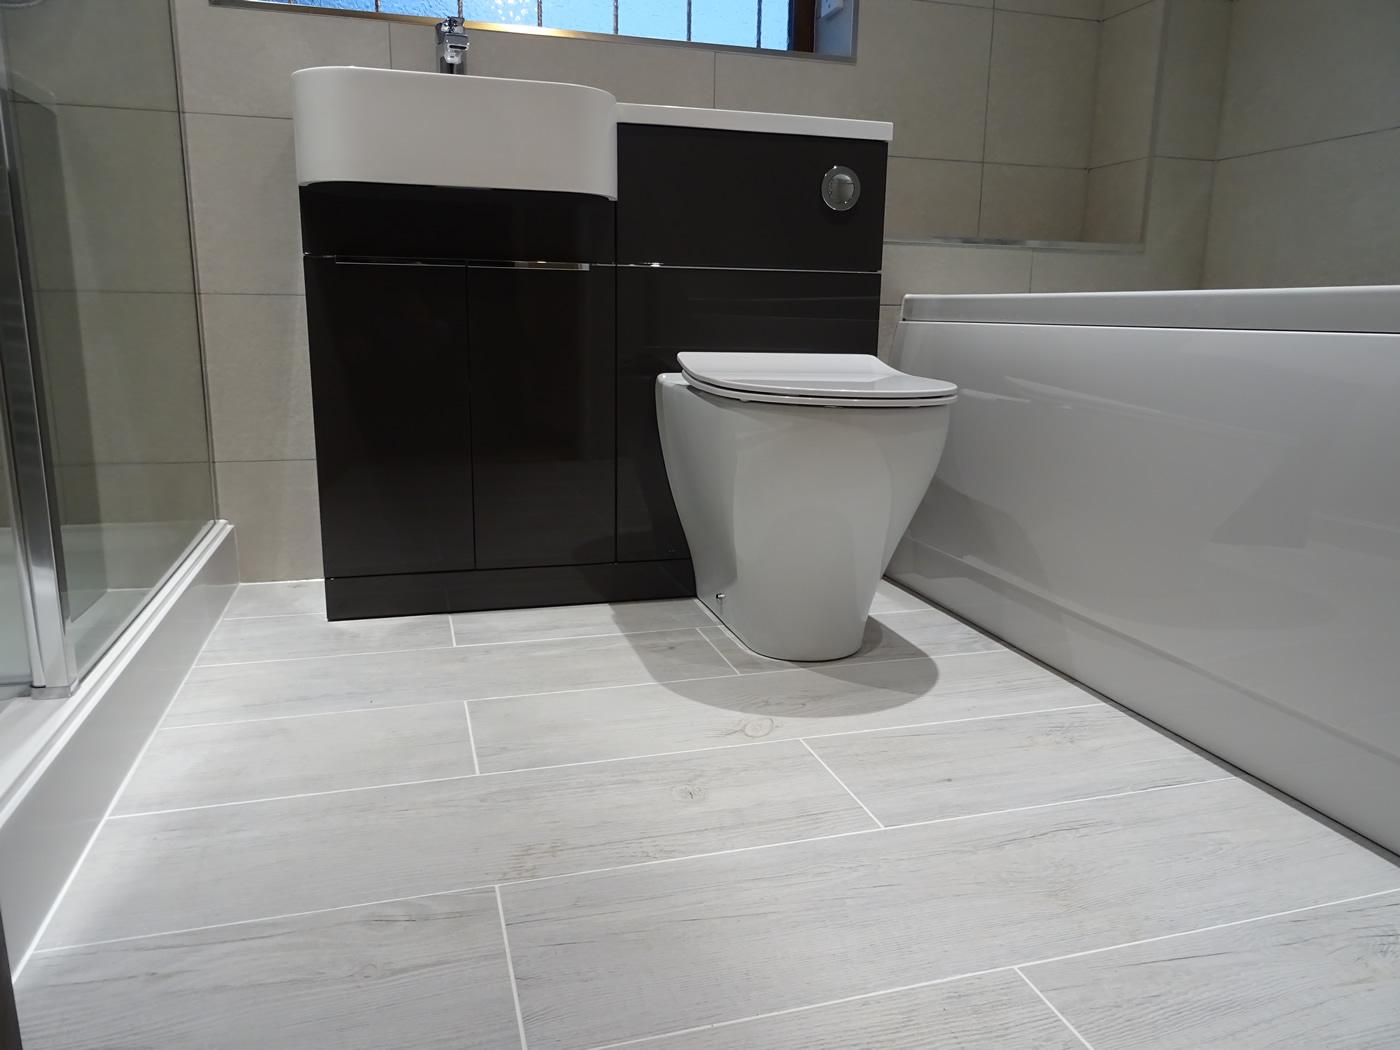 Wood Effect Tiled Bathroom Floor